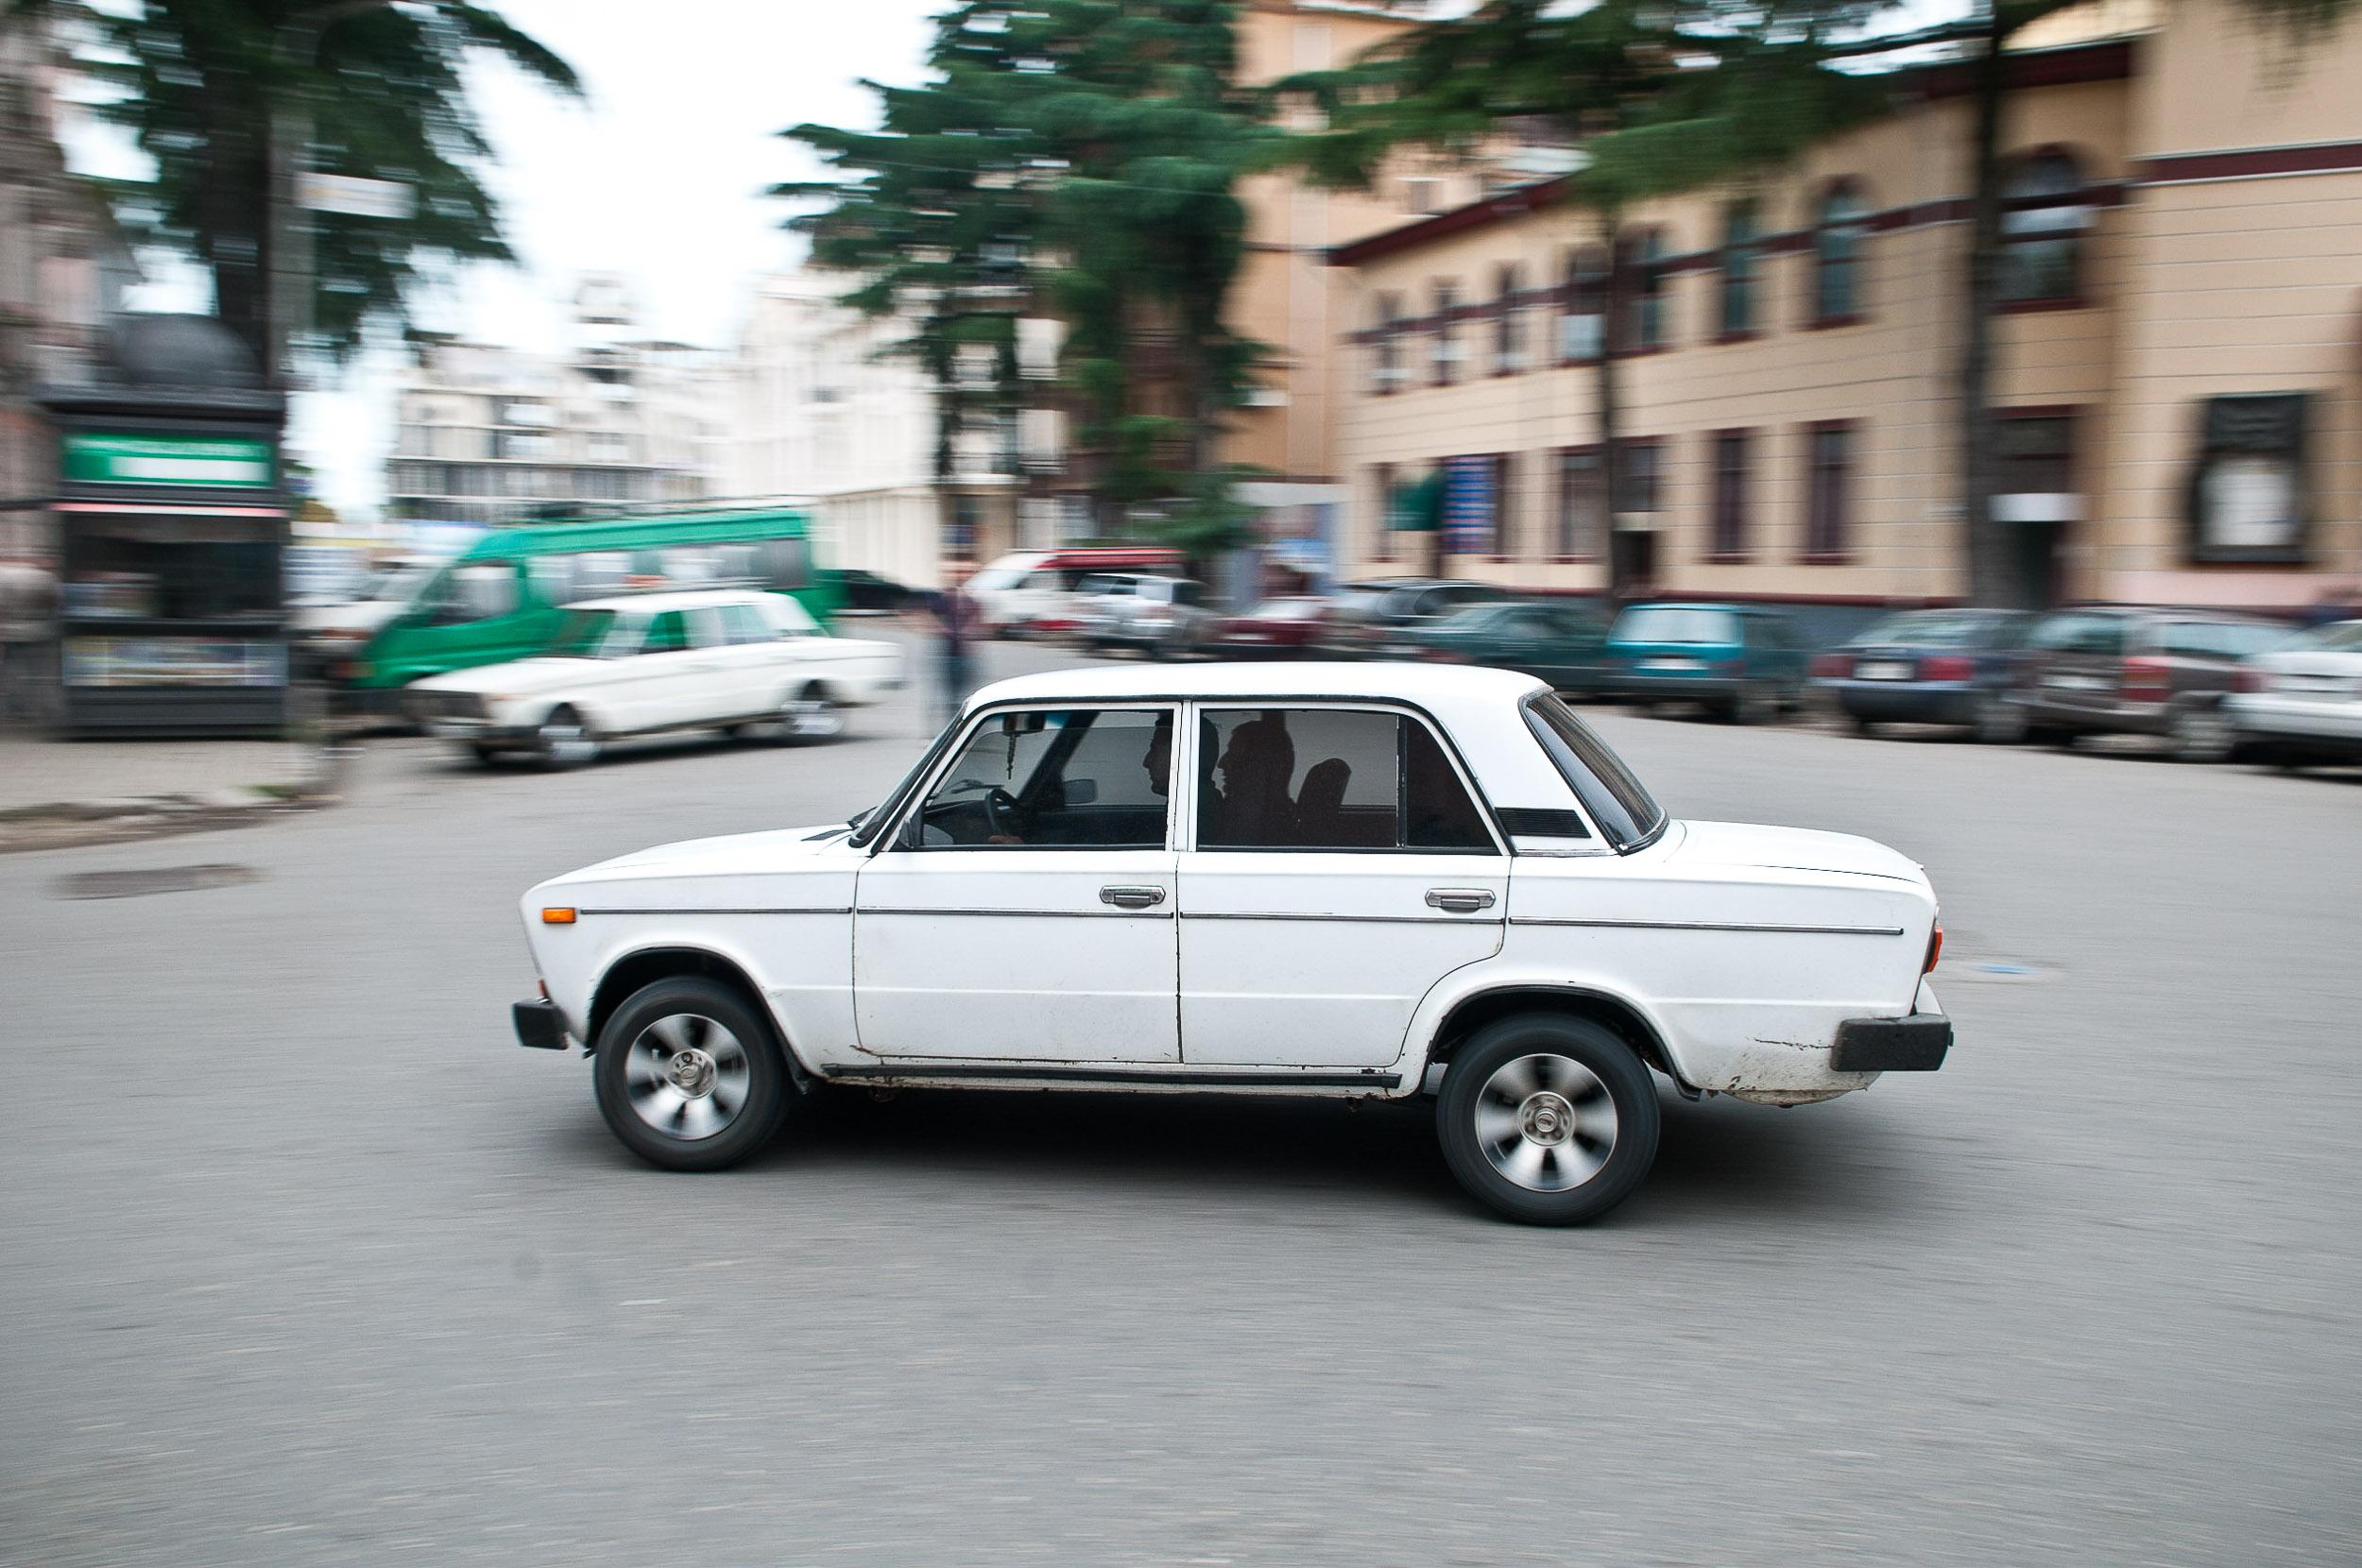 Lada vehicle, Batumi, Georgia.